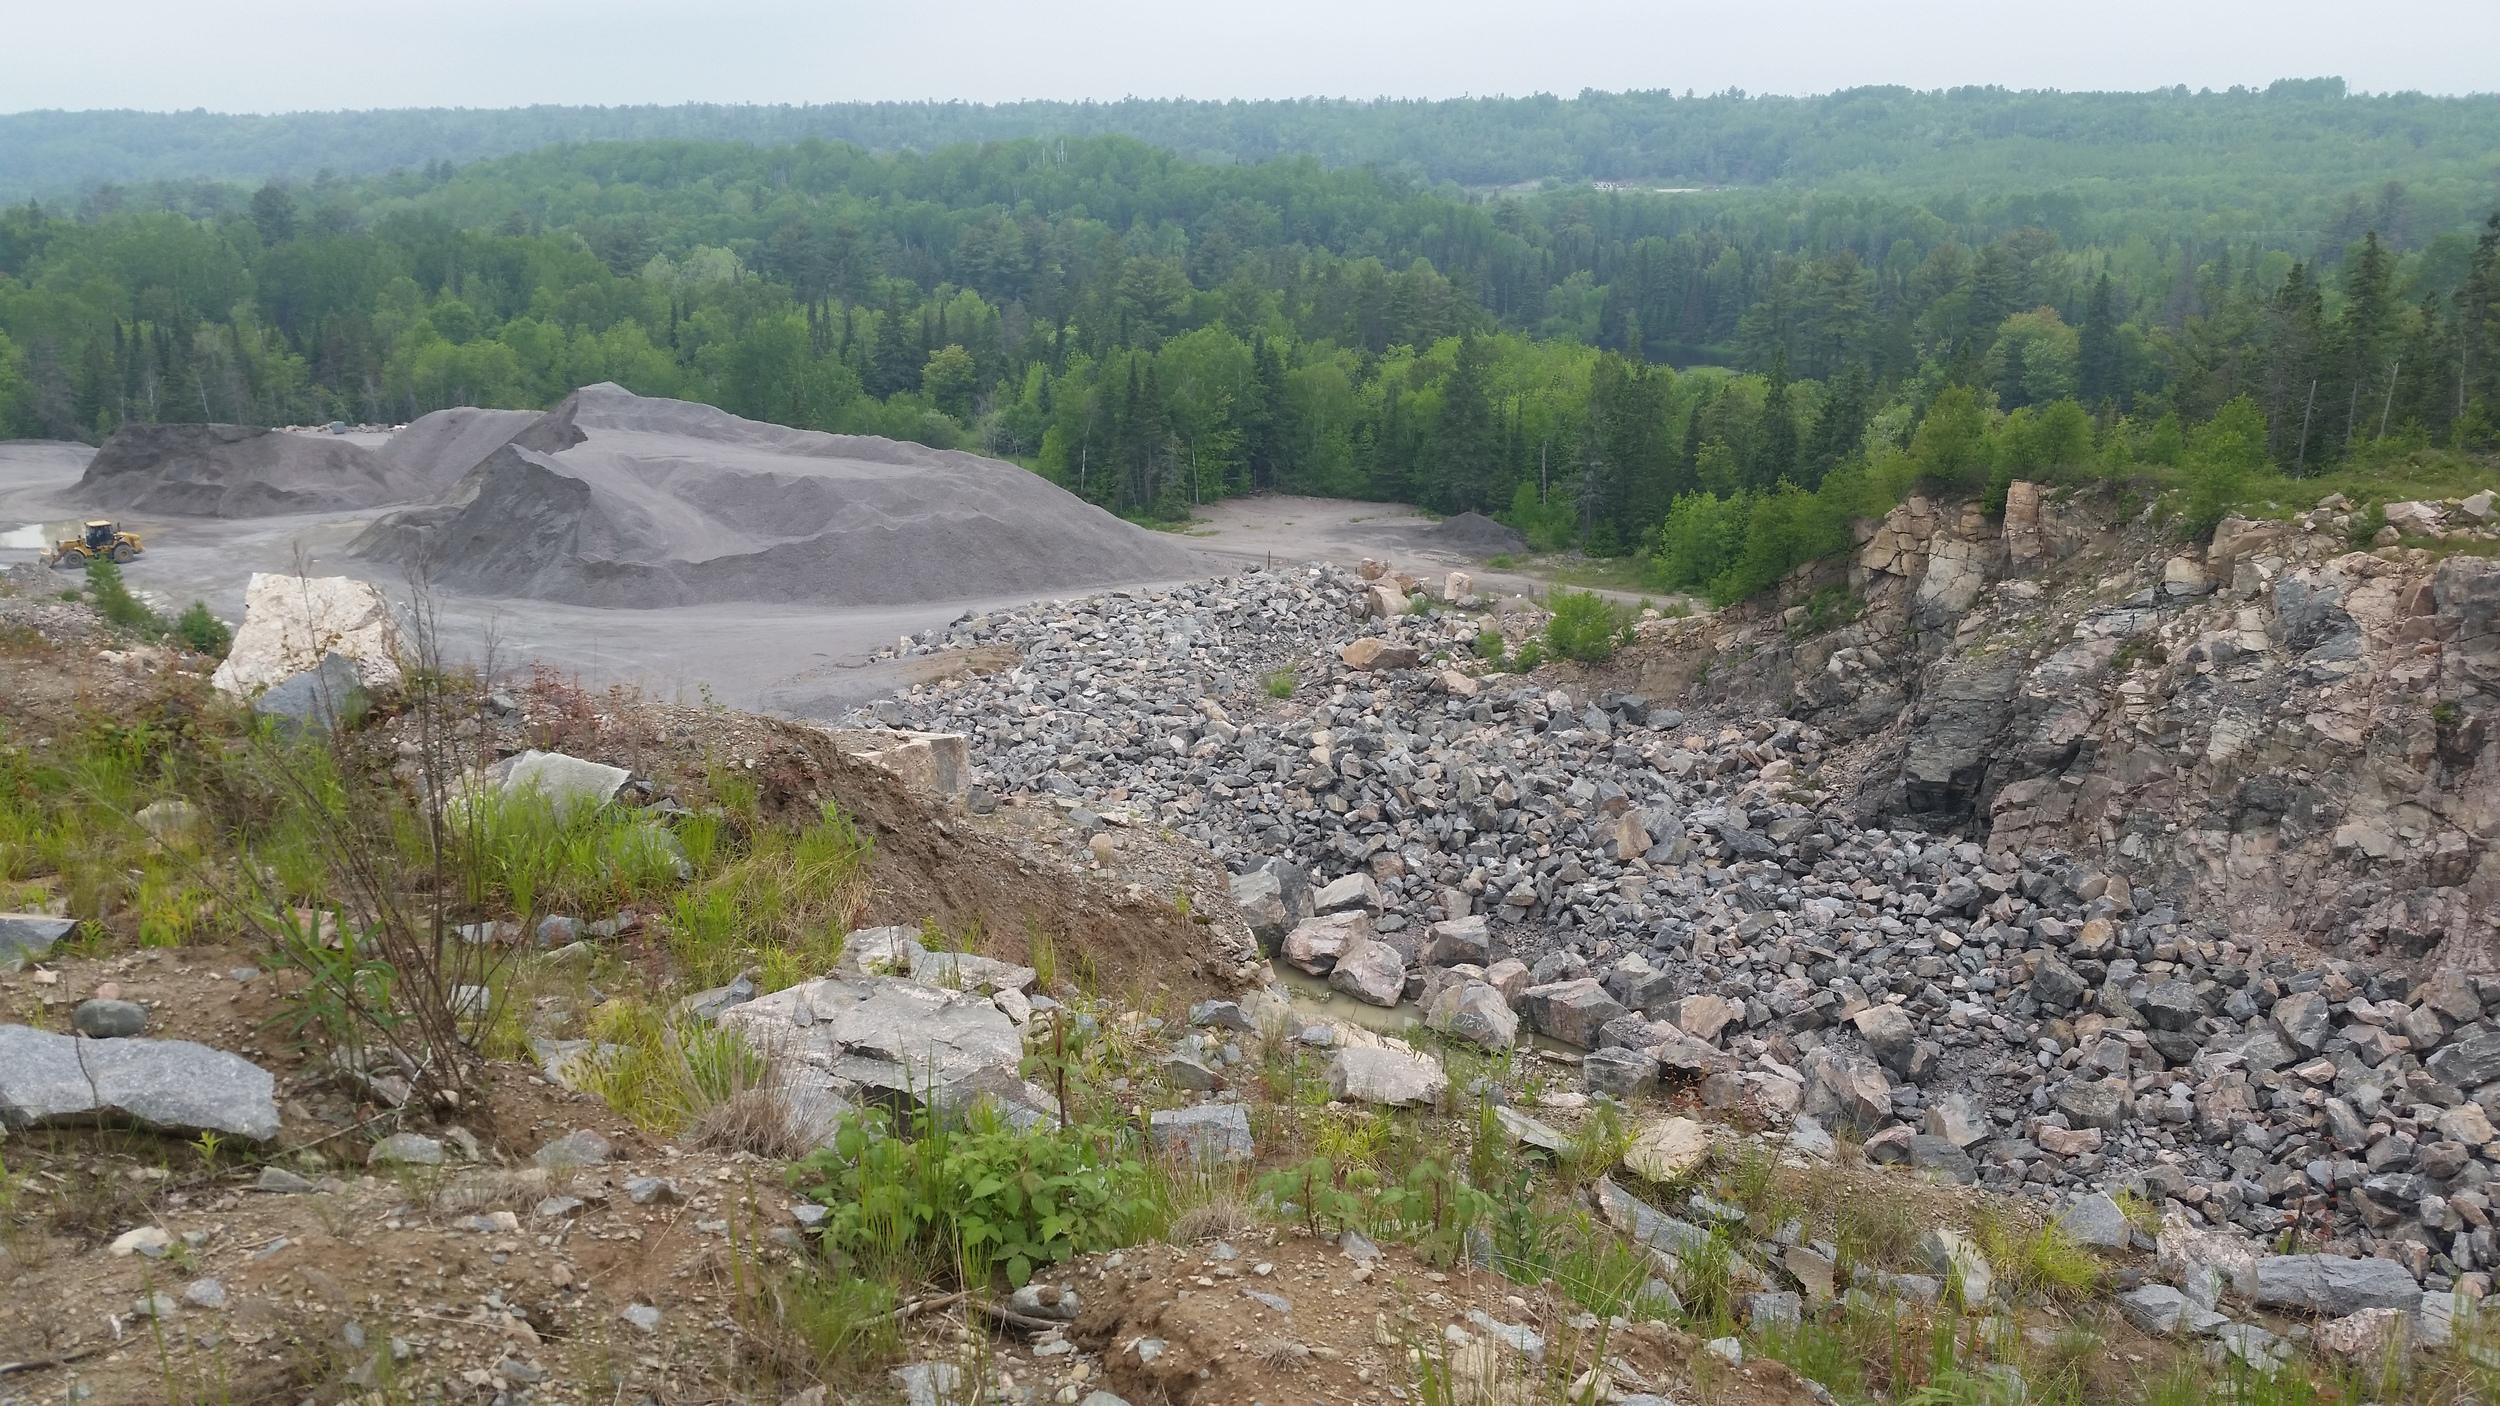 SRFN Quarry suppling aggregate